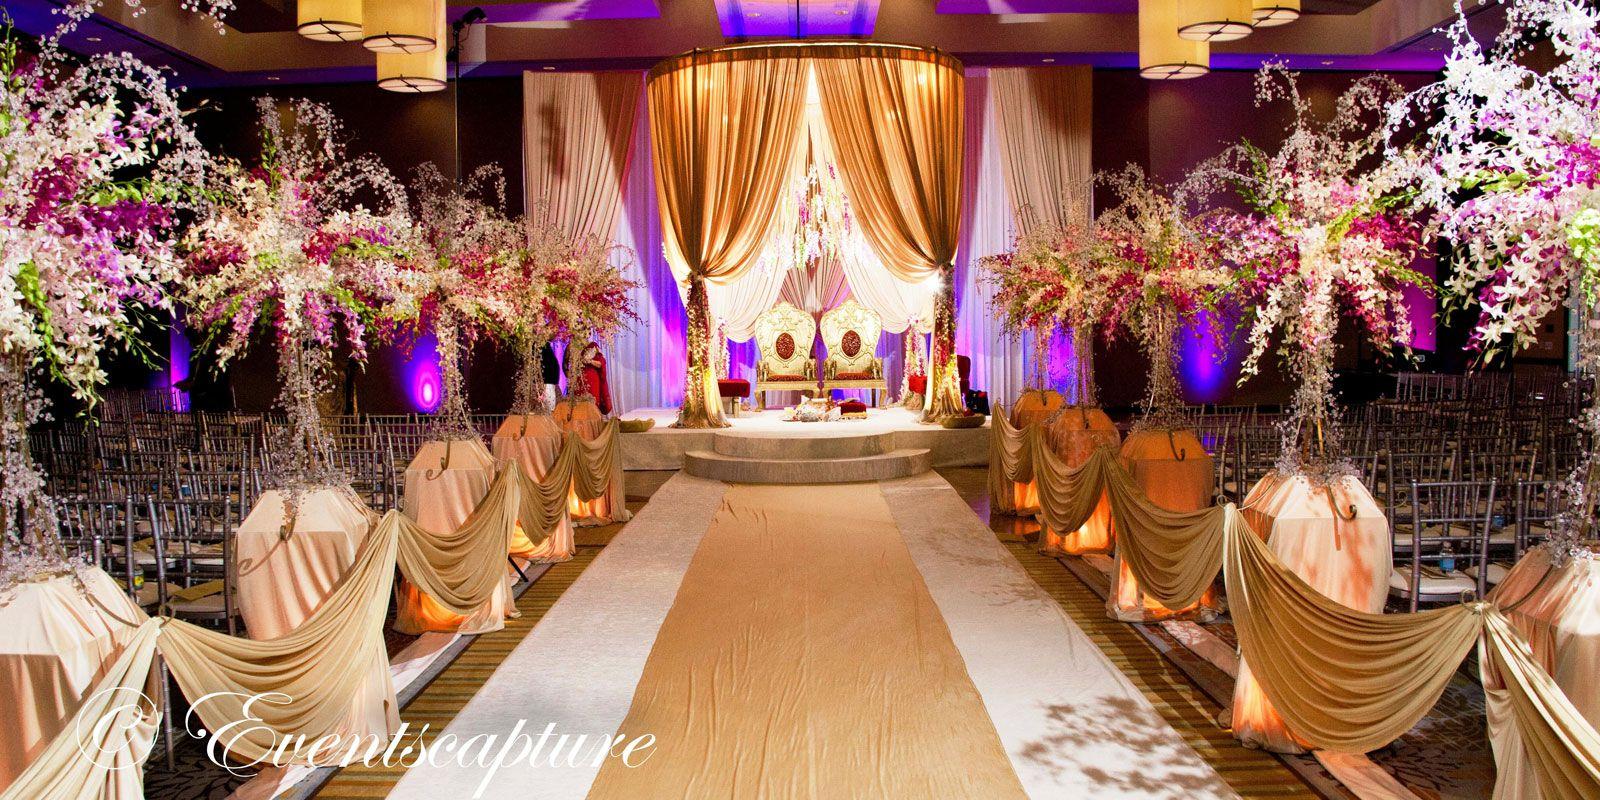 yanni design studio - chicago wedding flowers & decorations